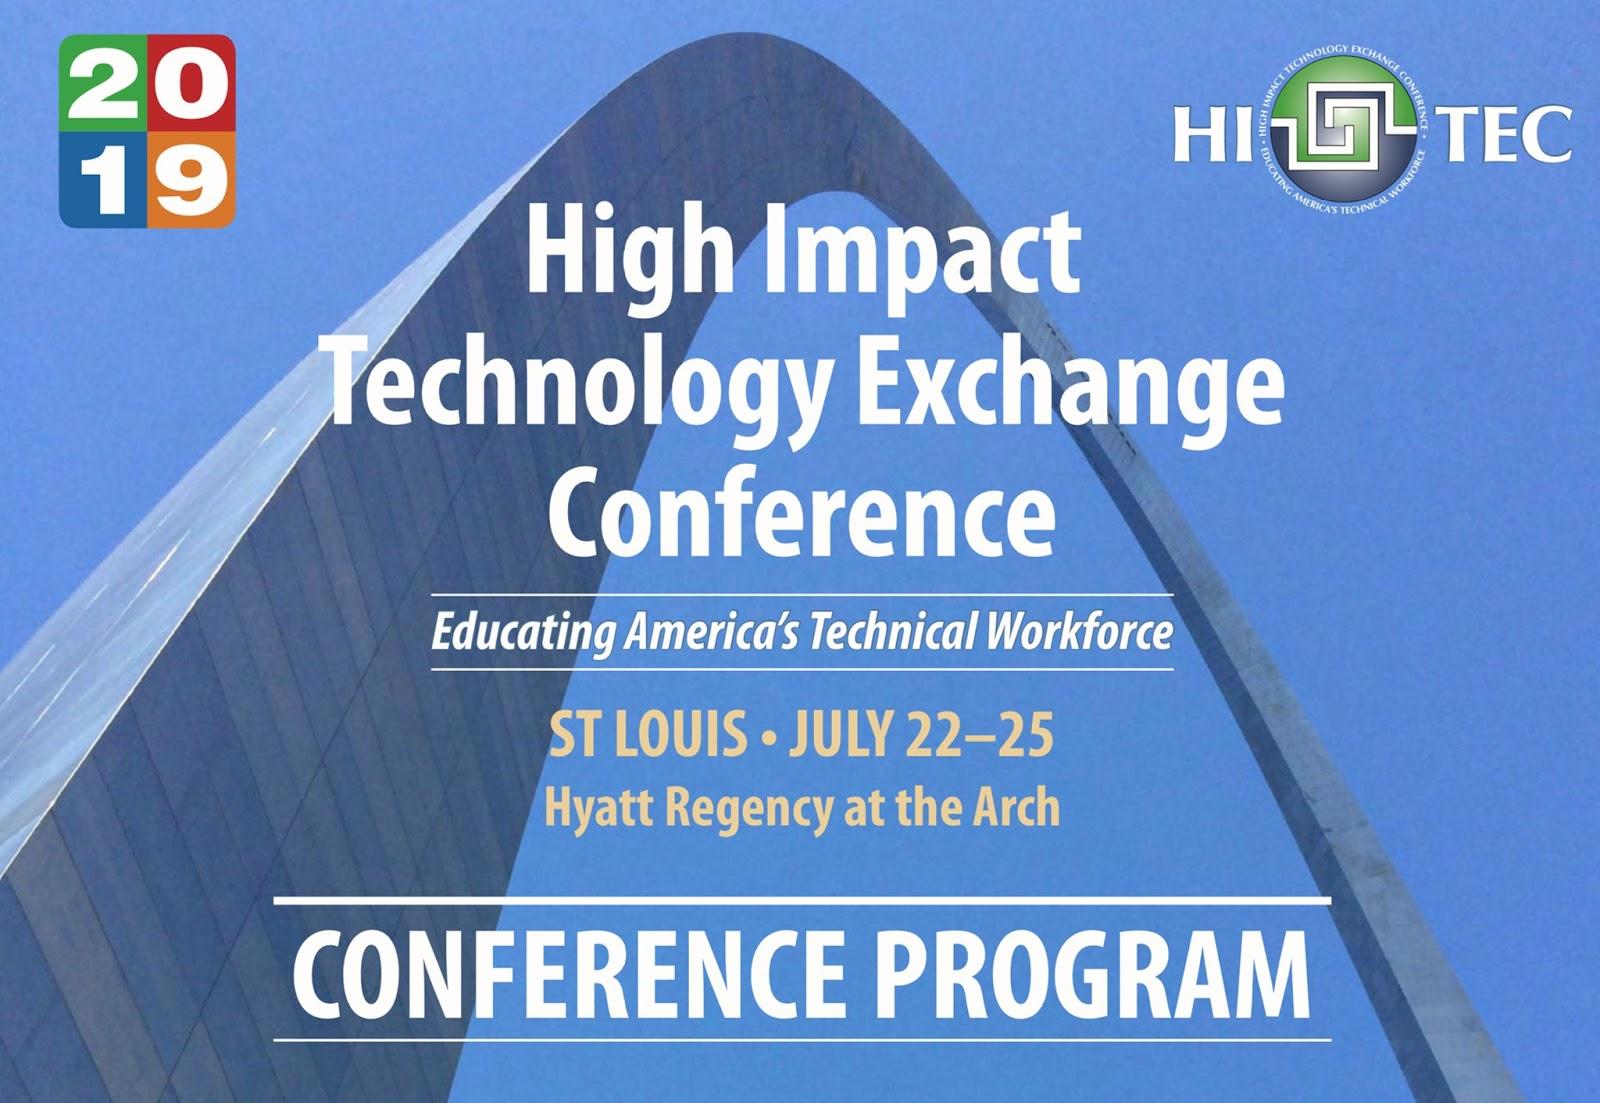 FLATE Focus: 2019 HI-TEC Conference: Focused on the Future